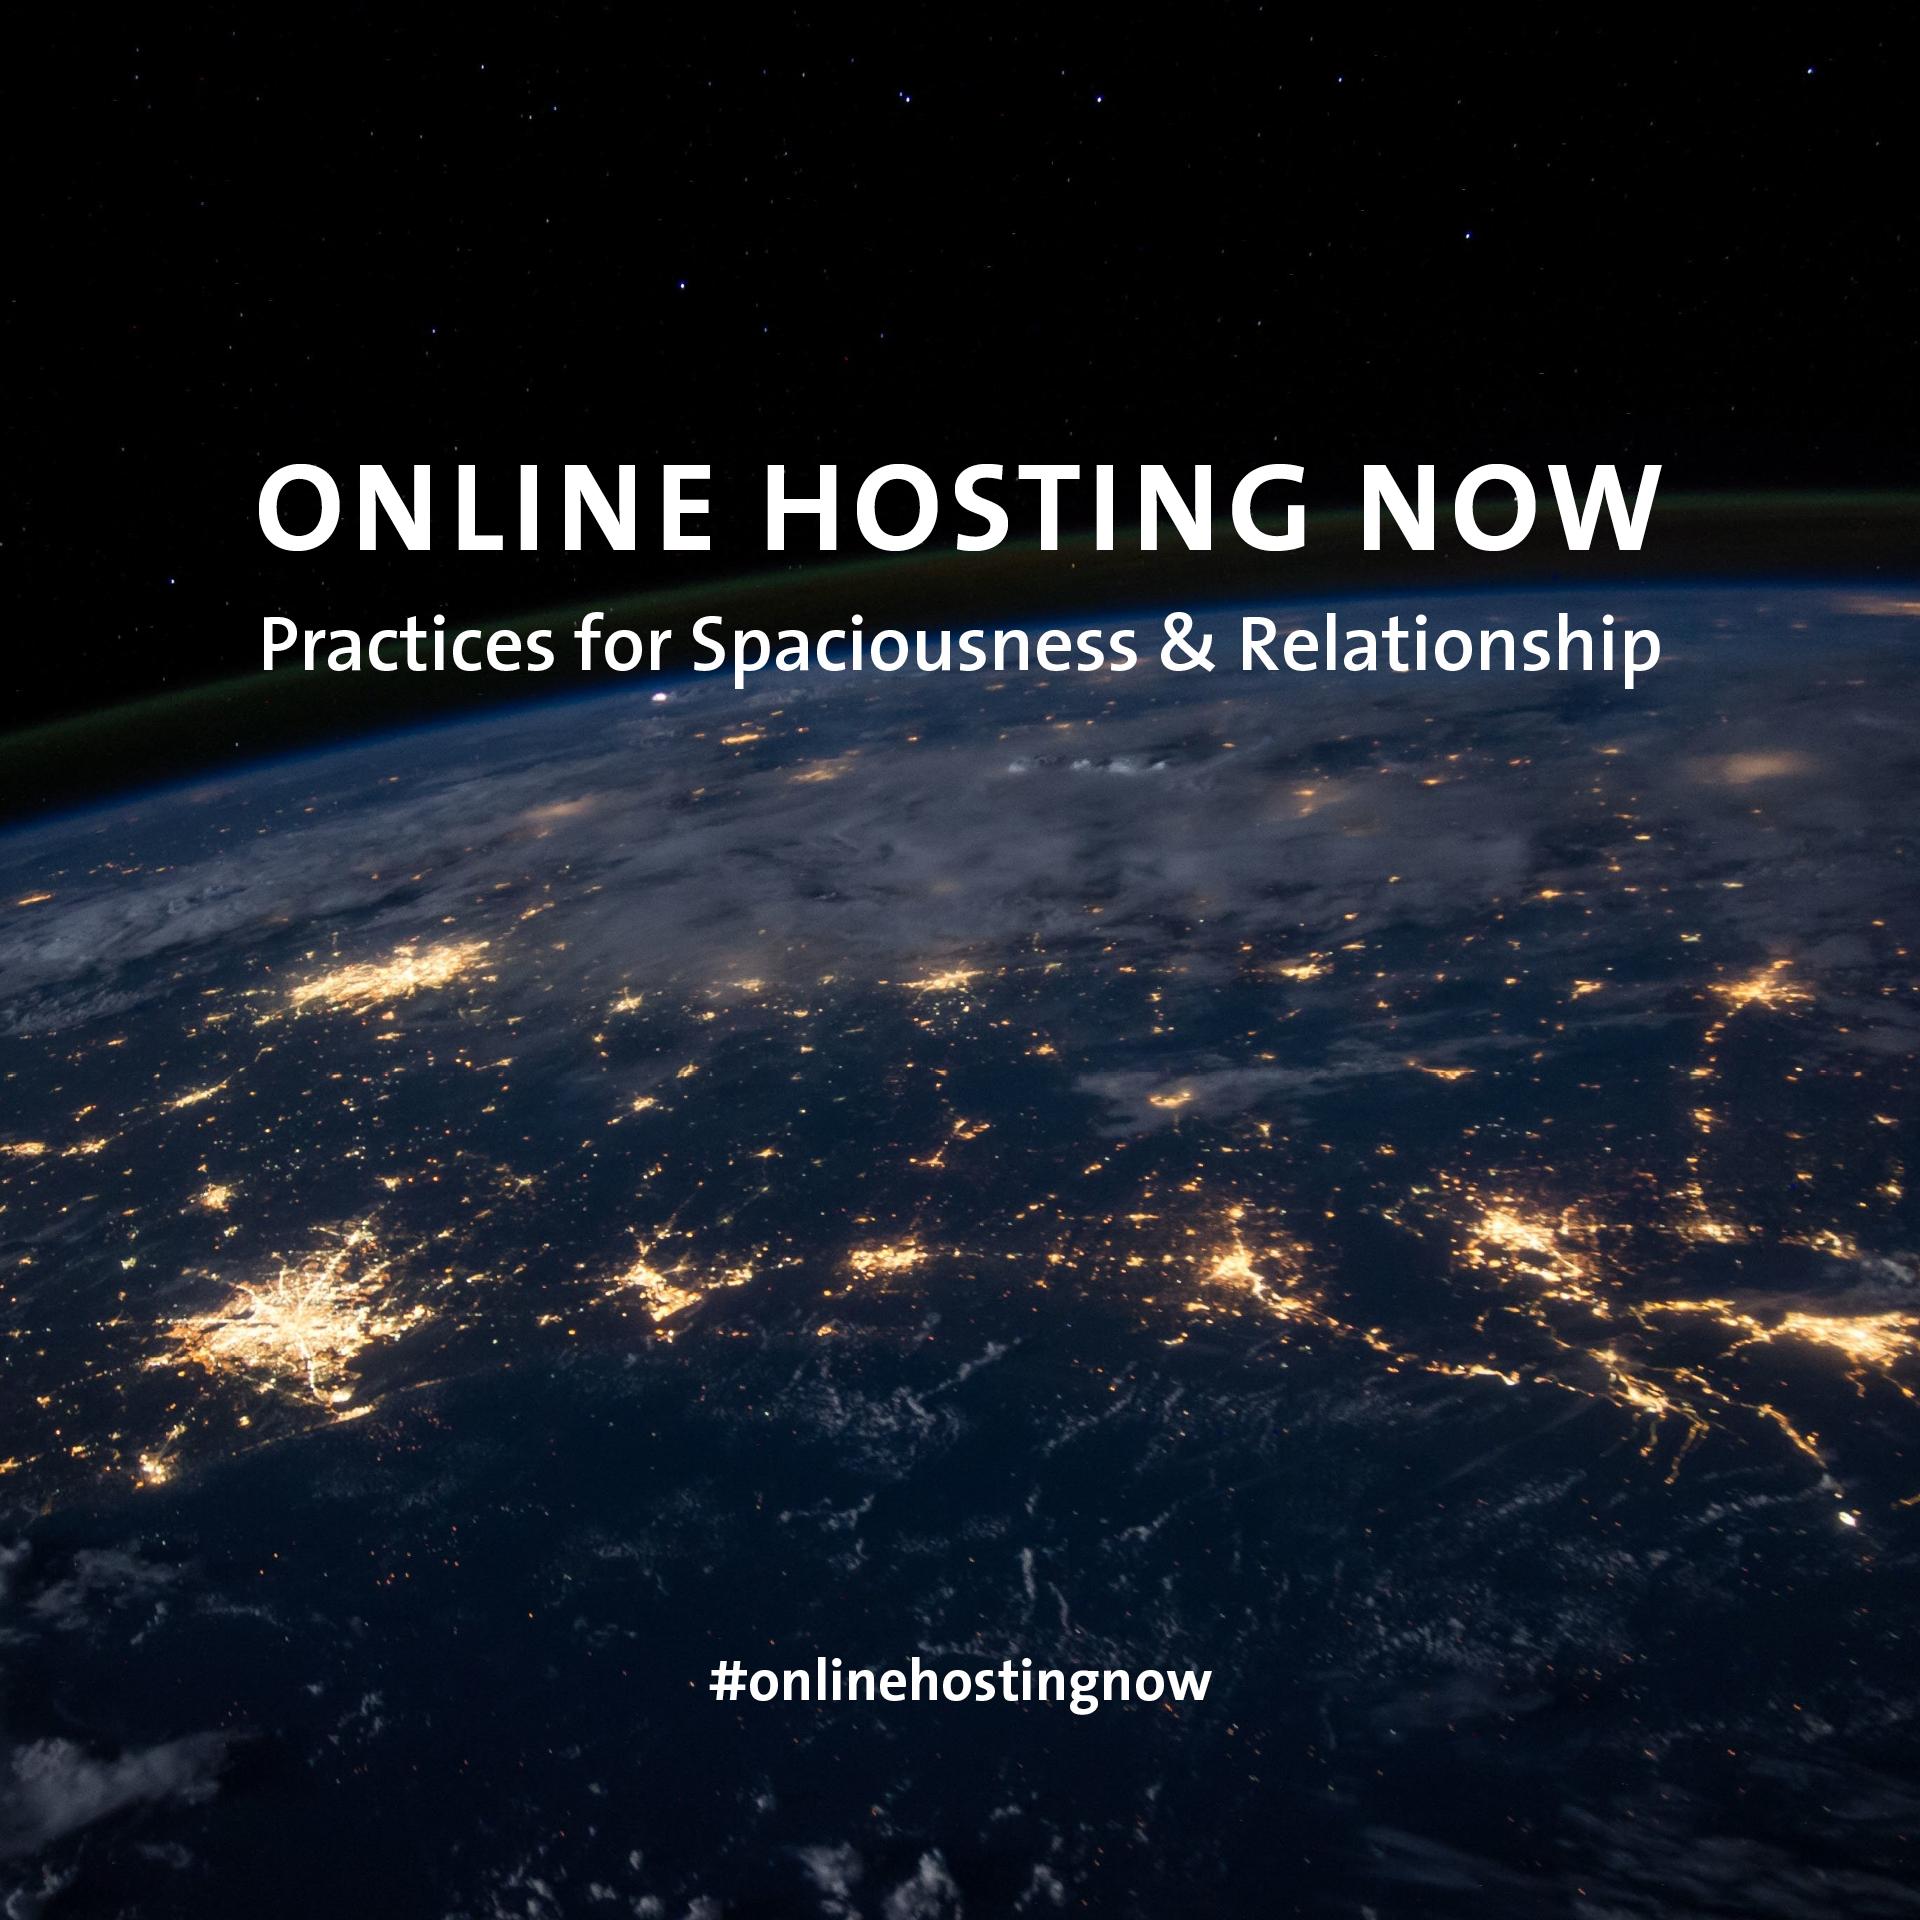 Online-Hosting-Now